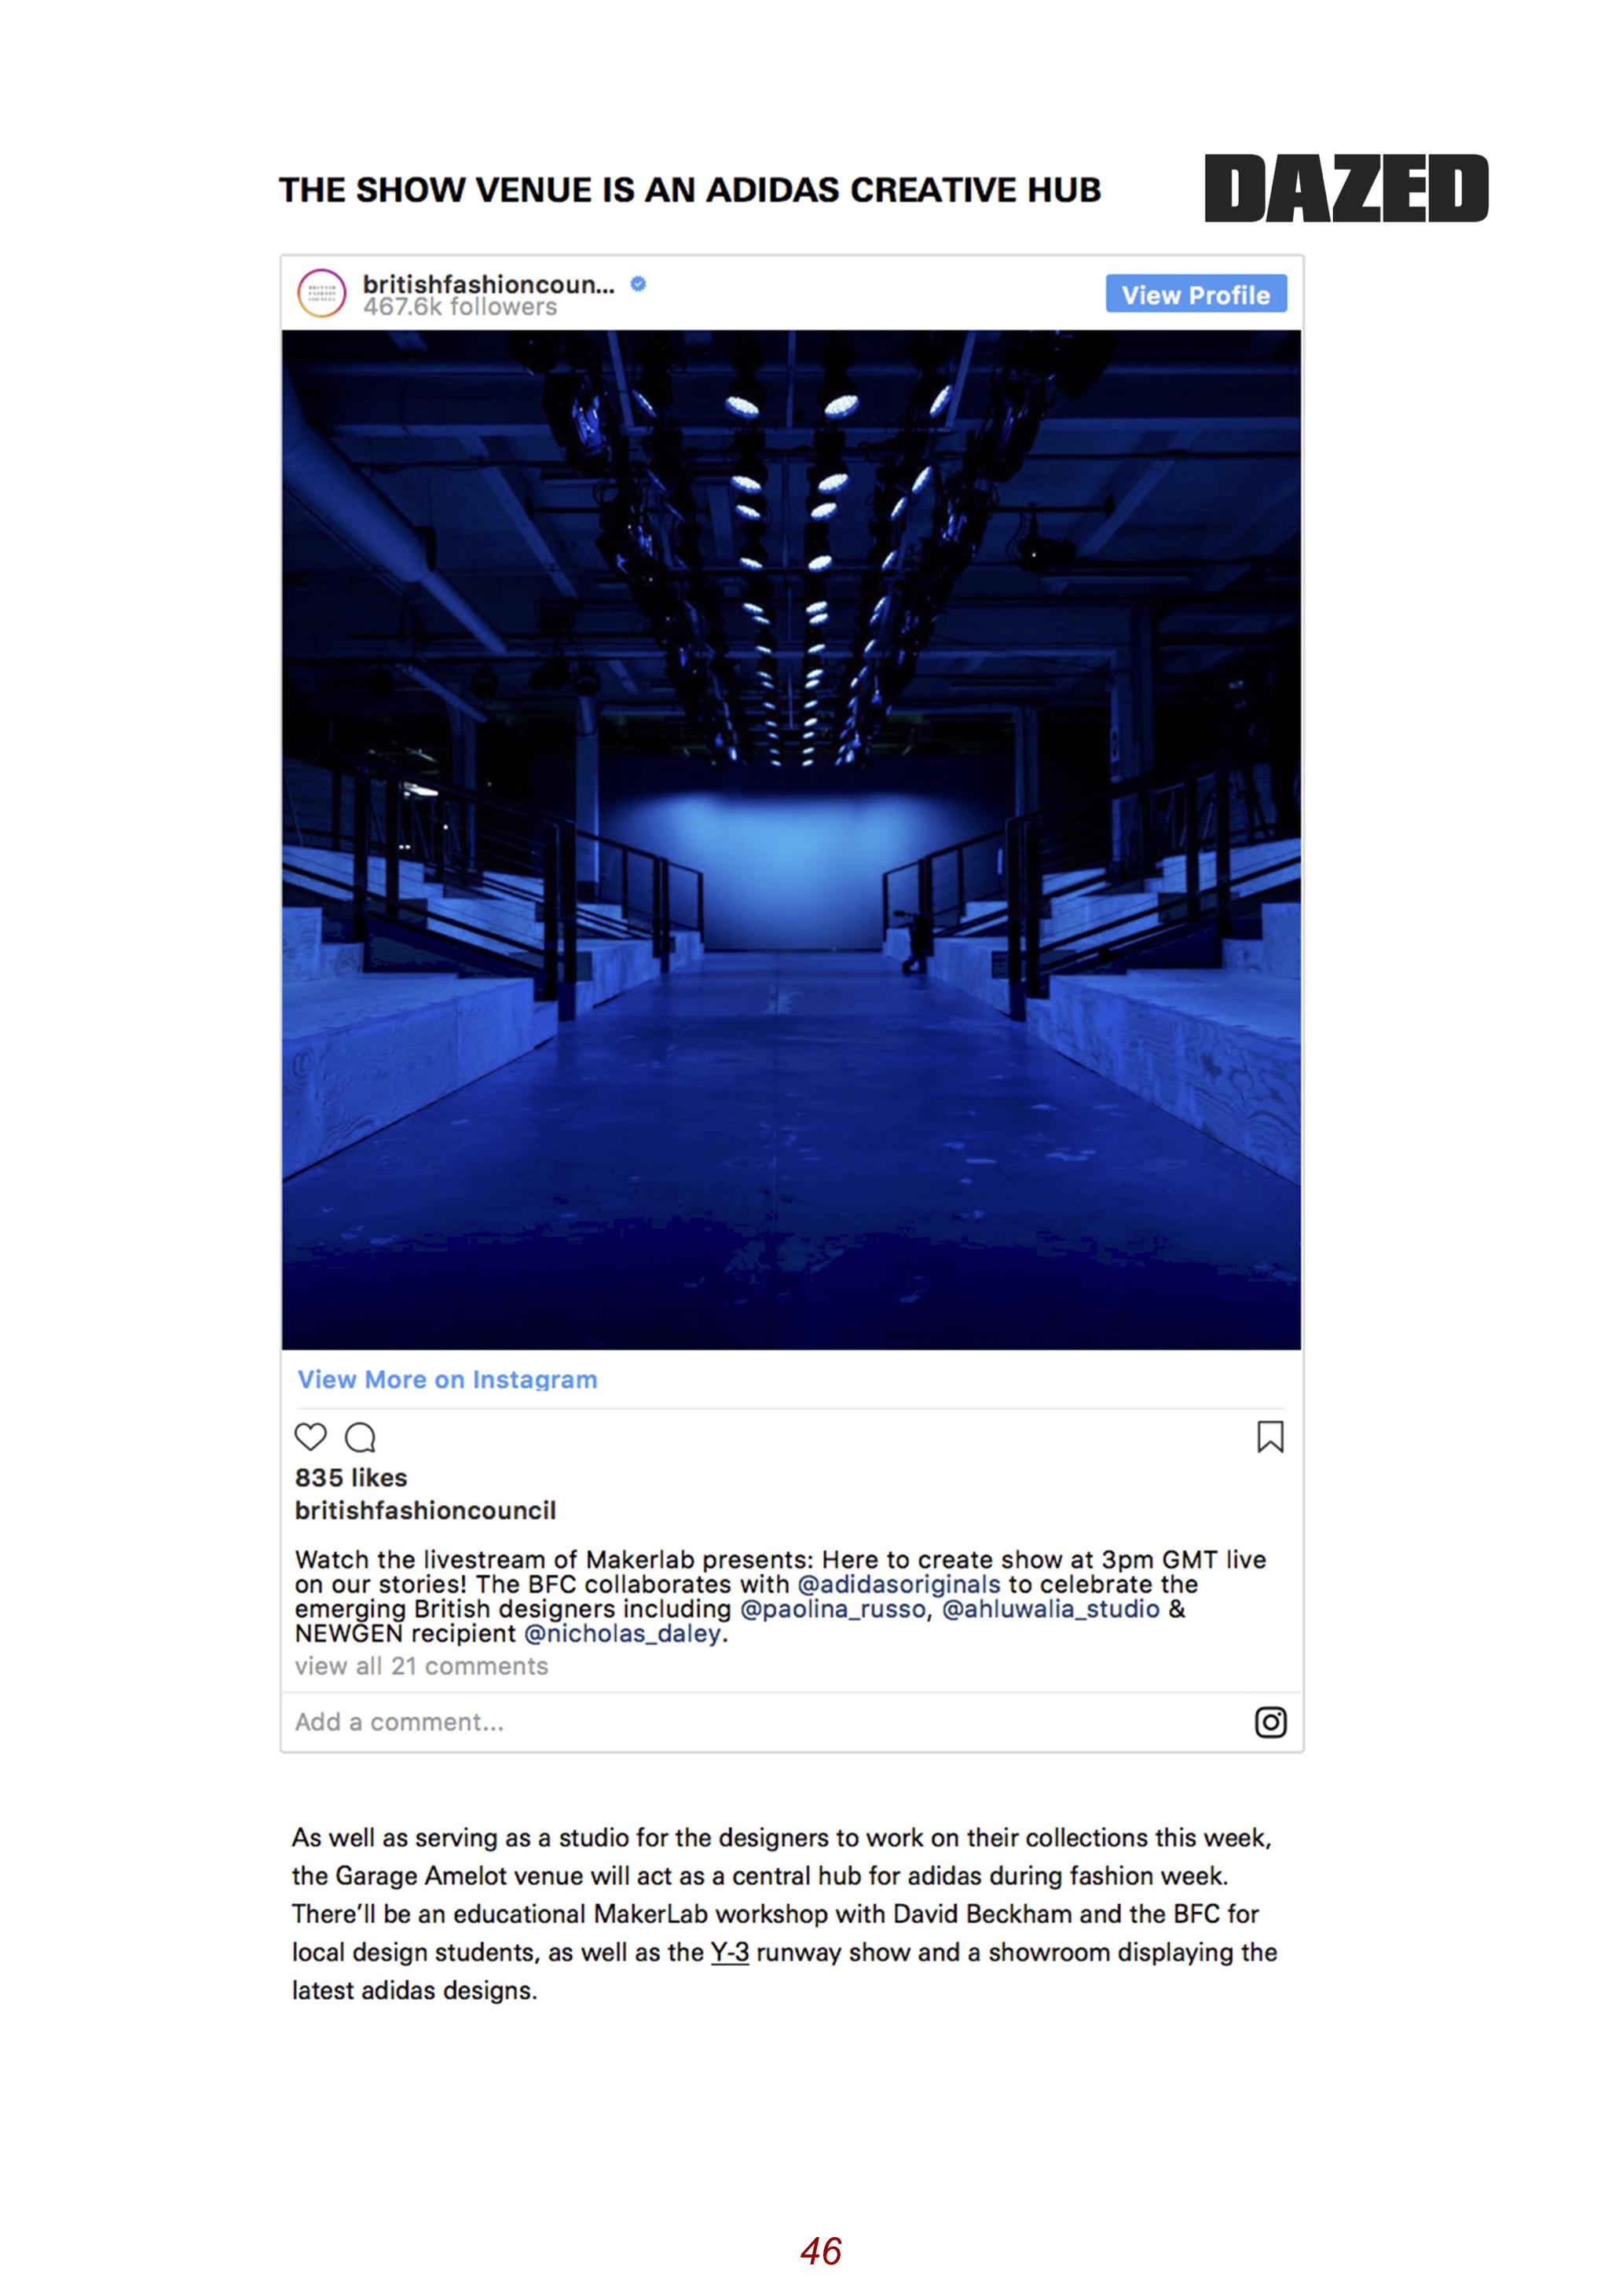 page 46 photo.jpg